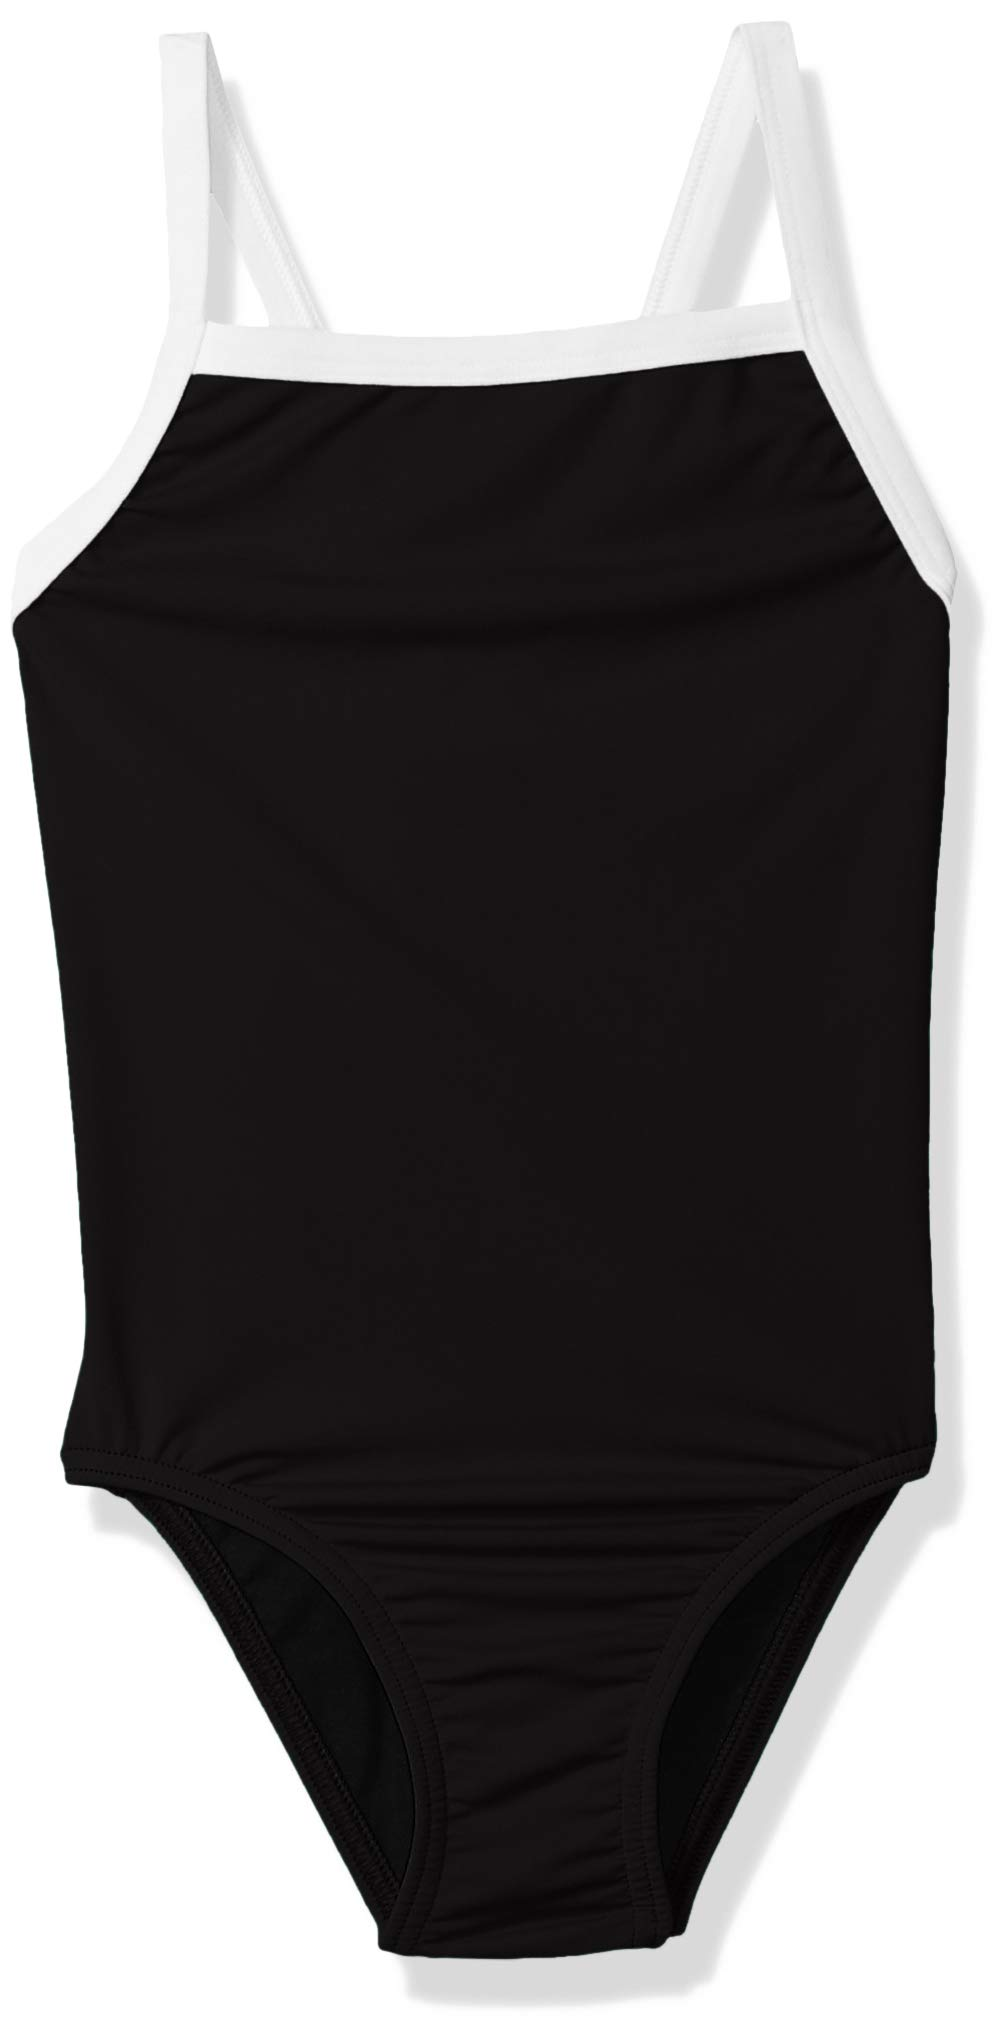 Speedo Girls' One Piece Swimsuit - Solid Flyback Training Suit